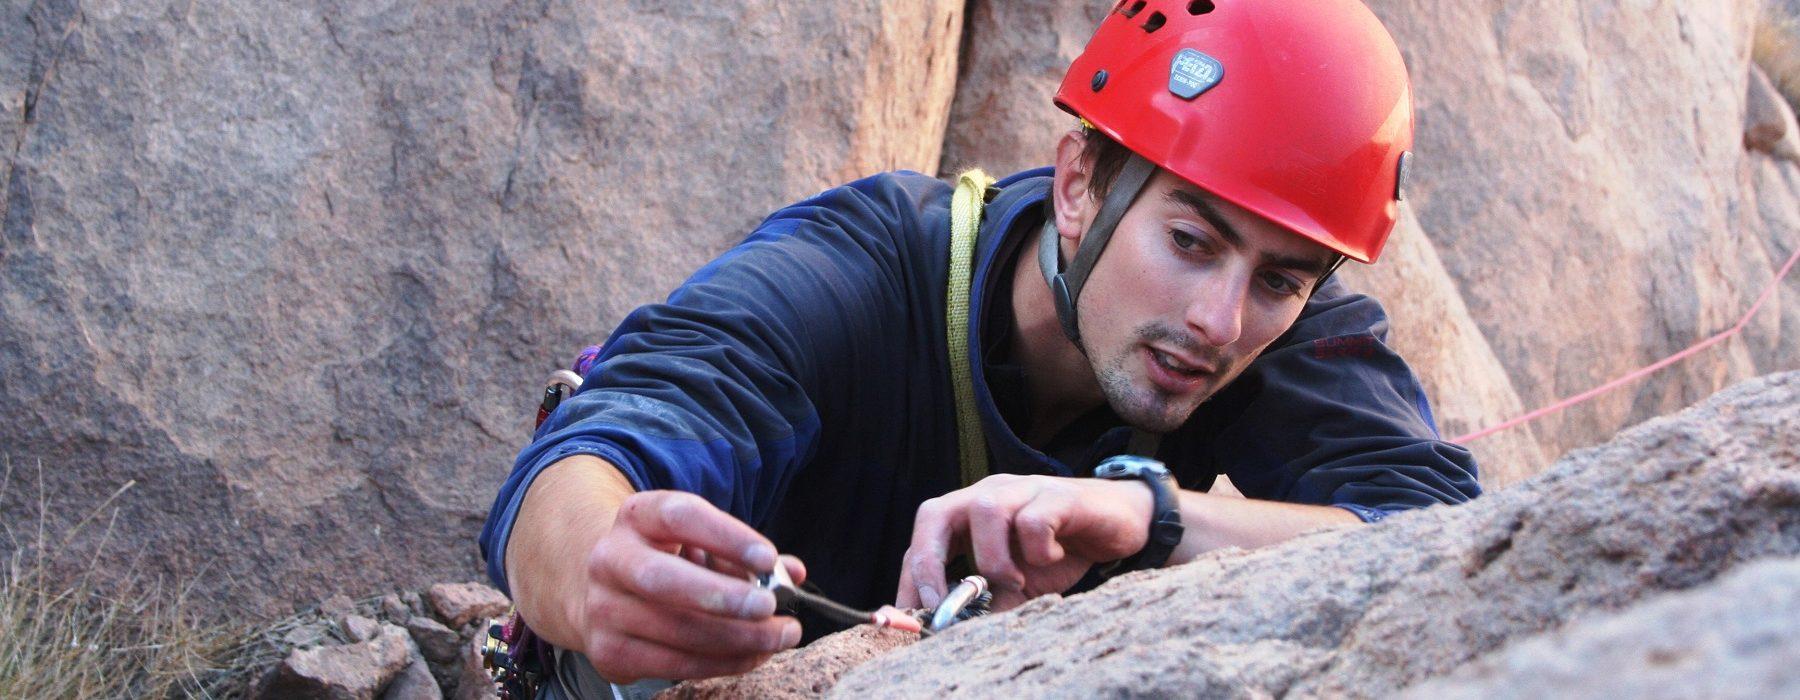 trad-climbing-st-catherine-1-1